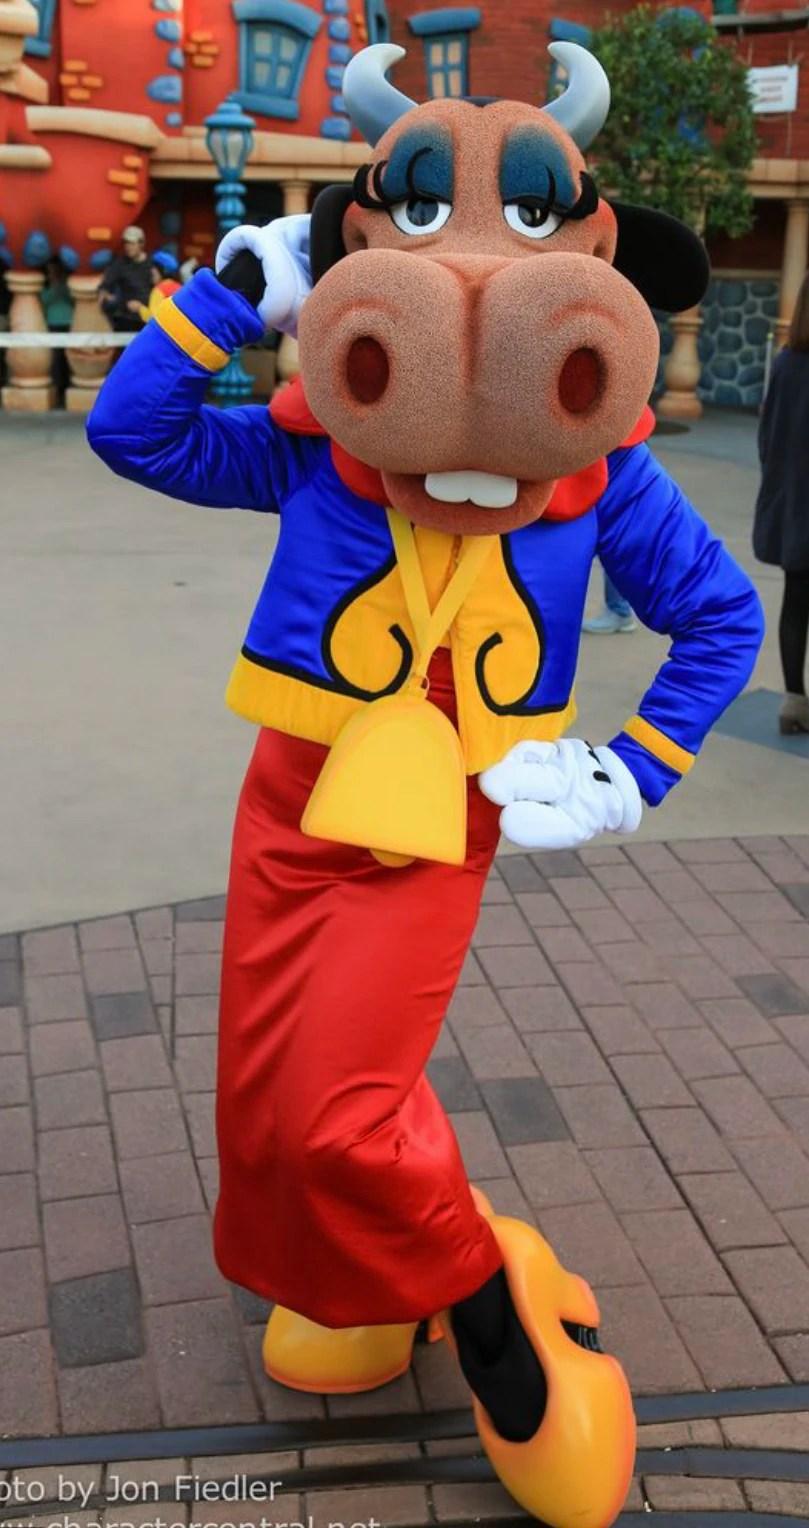 Clarabelle Cow Disney Parks Characters Wiki FANDOM